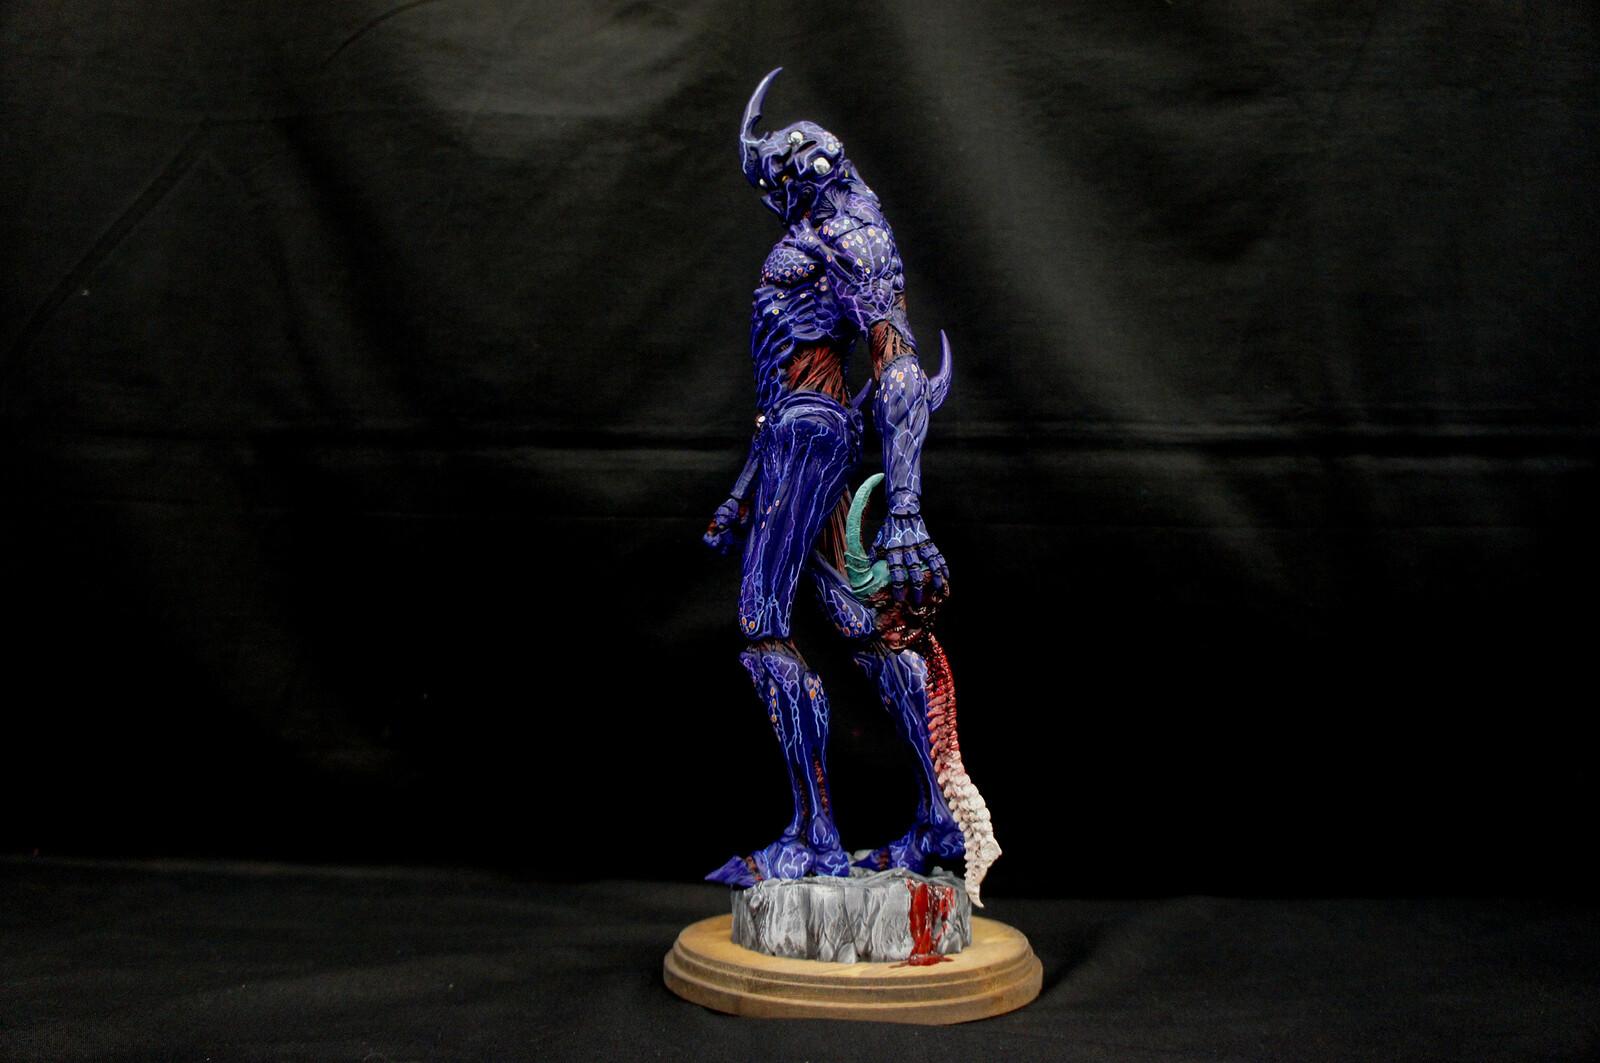 Vile Guyver Art Statue 邪悪な強殖装甲ガイバー https://www.solidart.club/